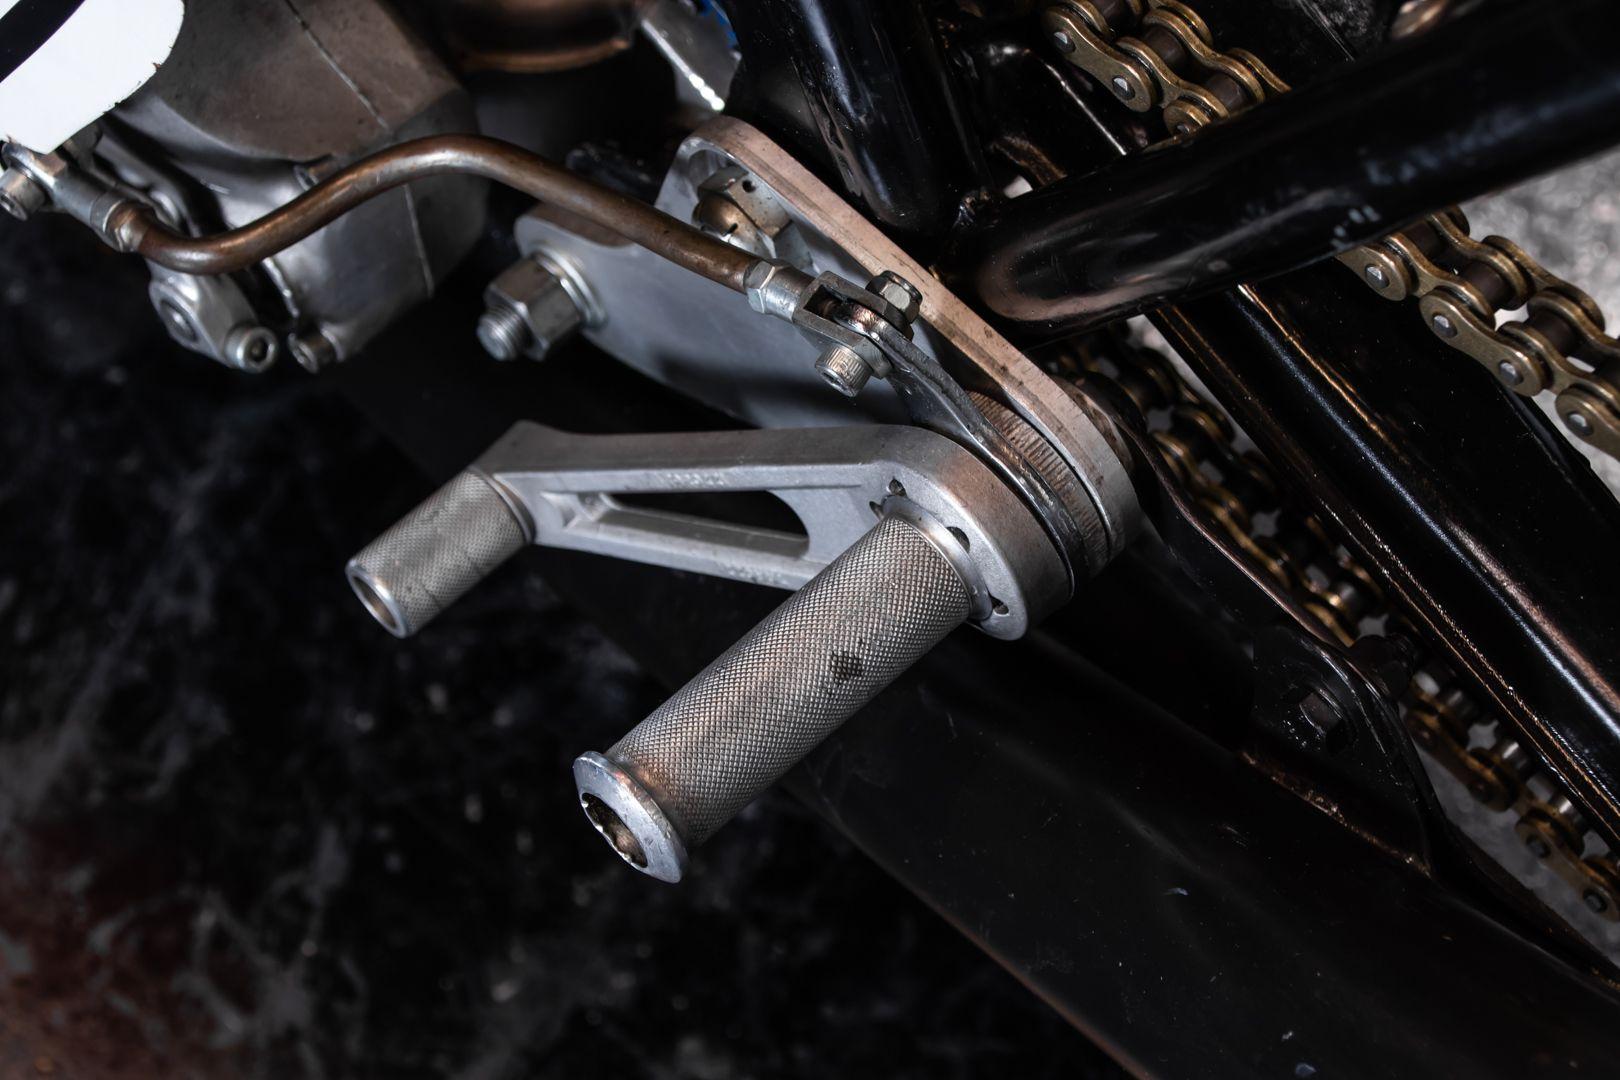 1973 Honda 750 Daytona Replica 72334